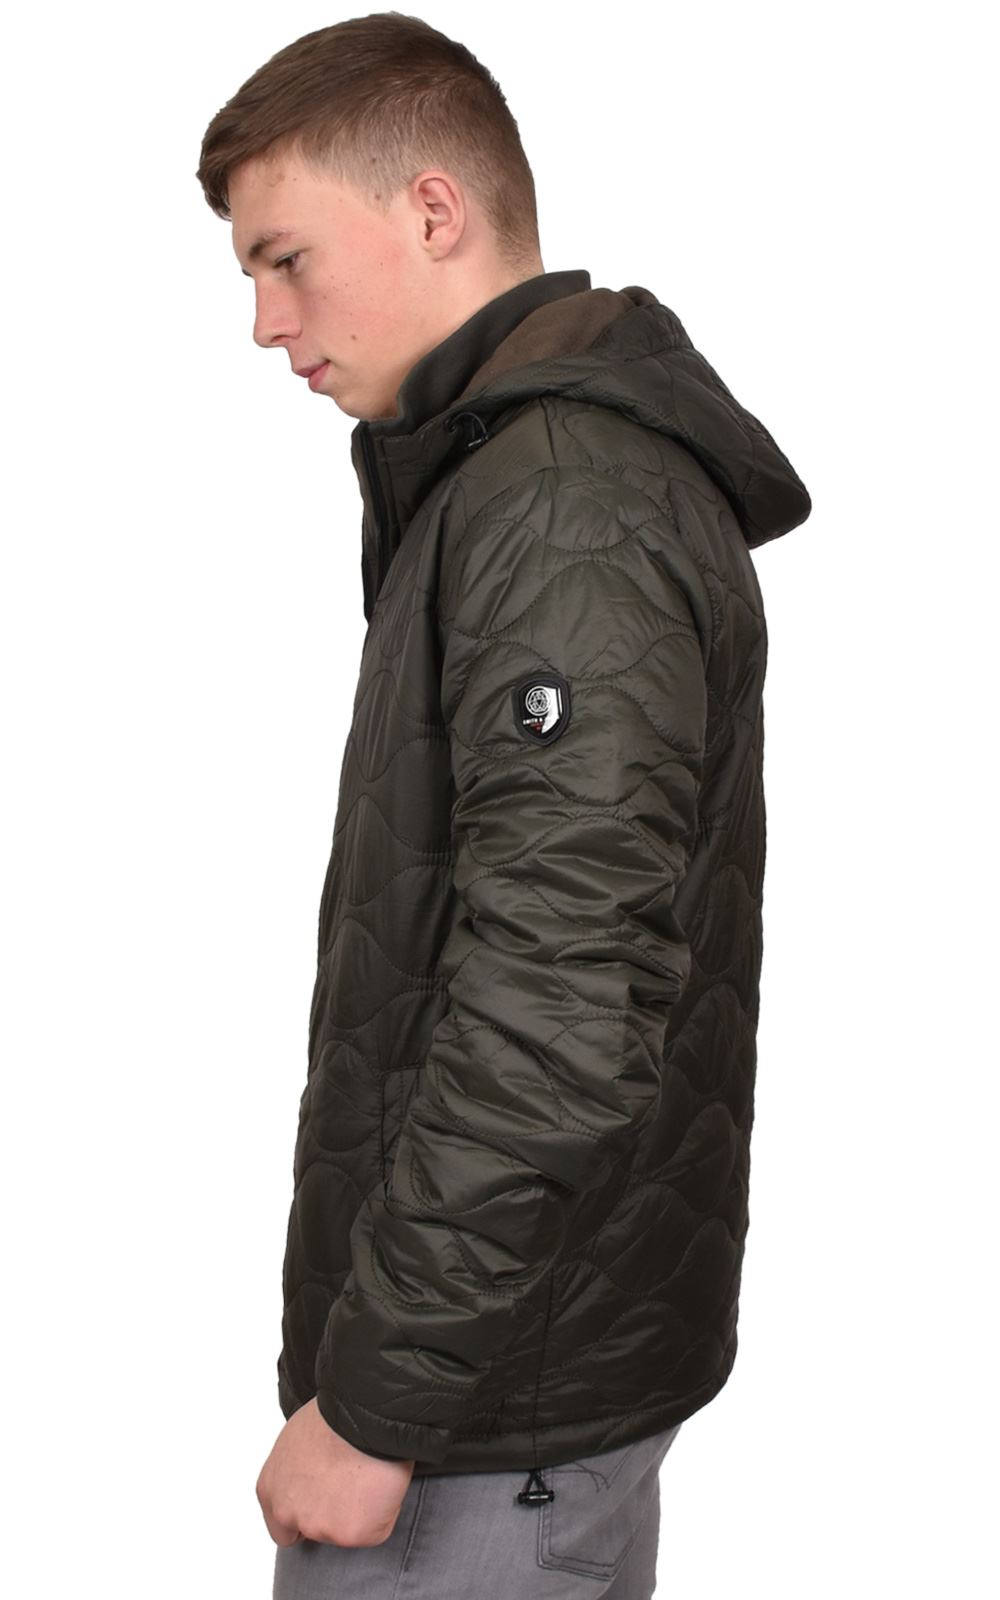 Mens-Smith-amp-Jones-Jacket-Full-Zip-Fleece-Lined-Hooded-Light-Weight-Warm-Coat thumbnail 16